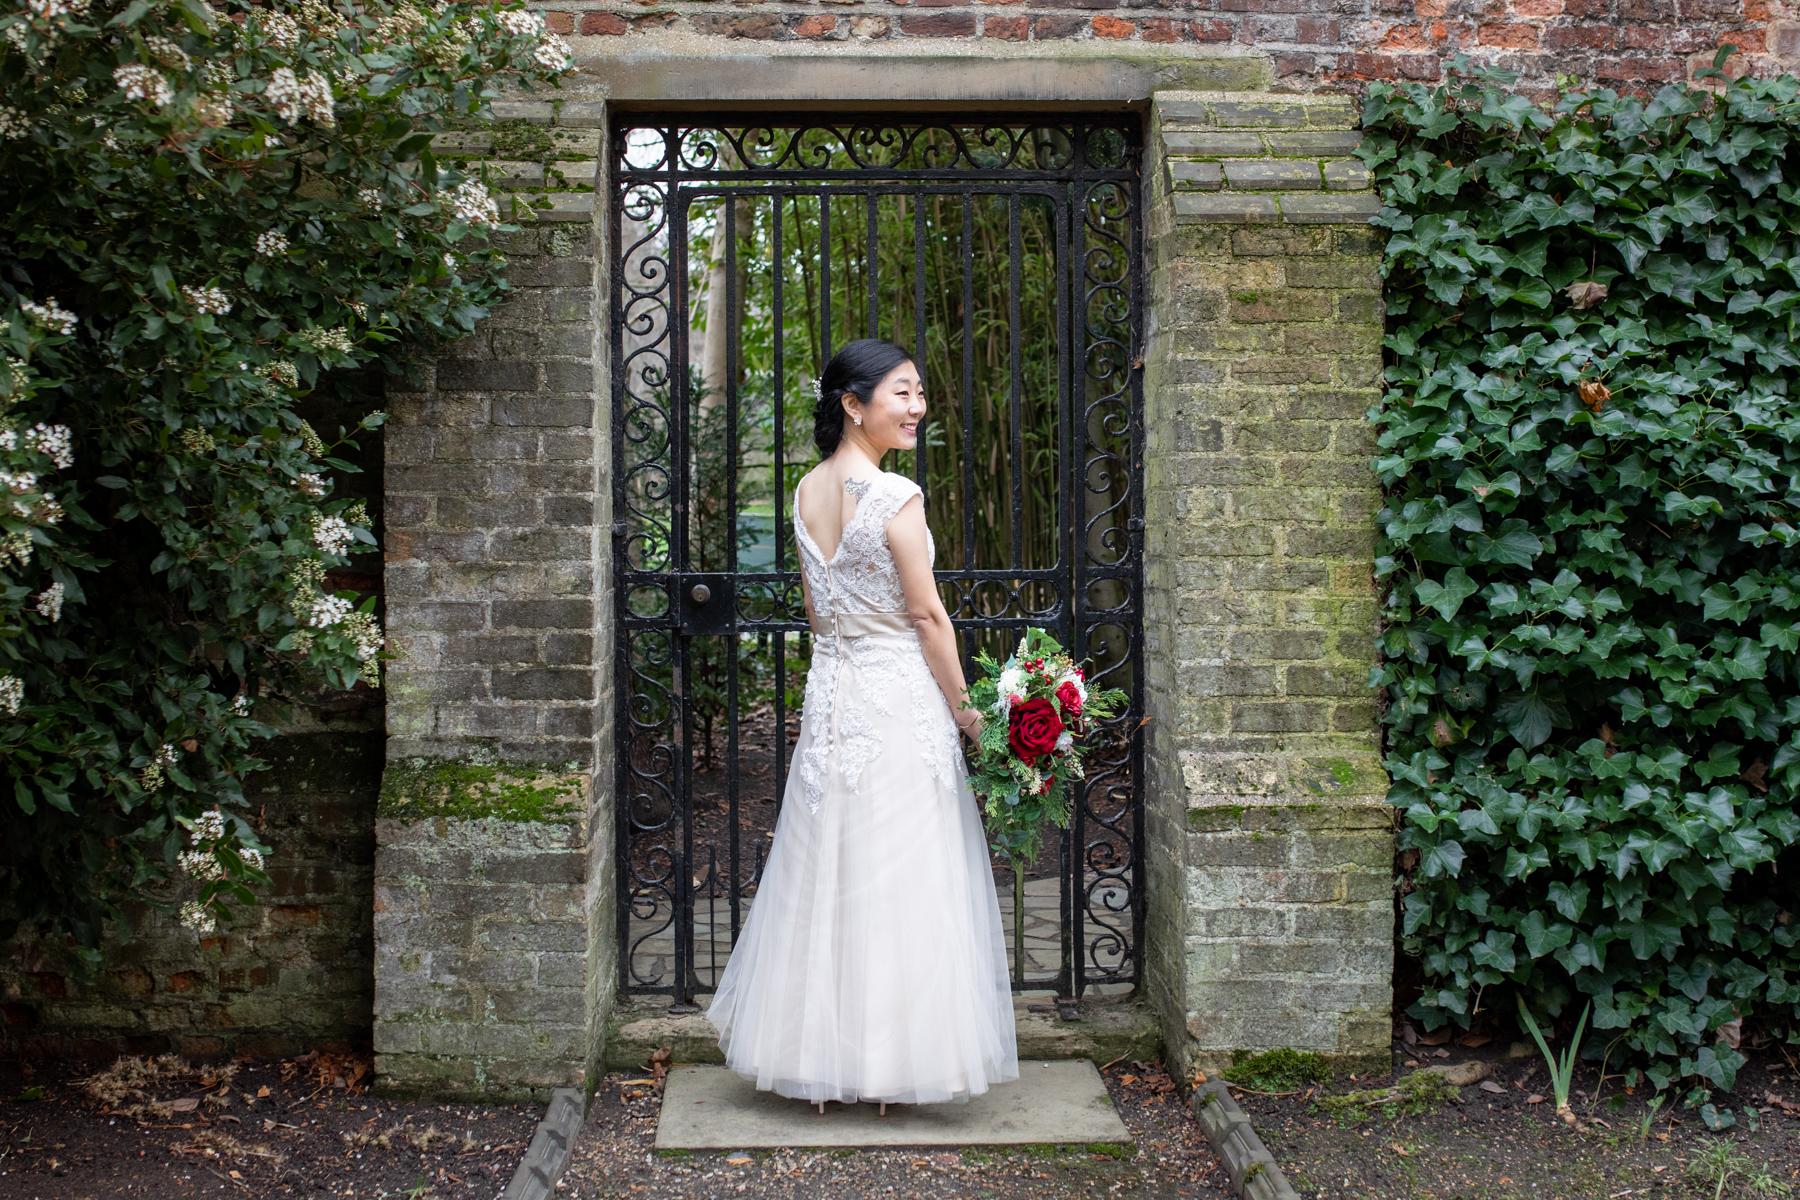 Bride at Emmanuel College